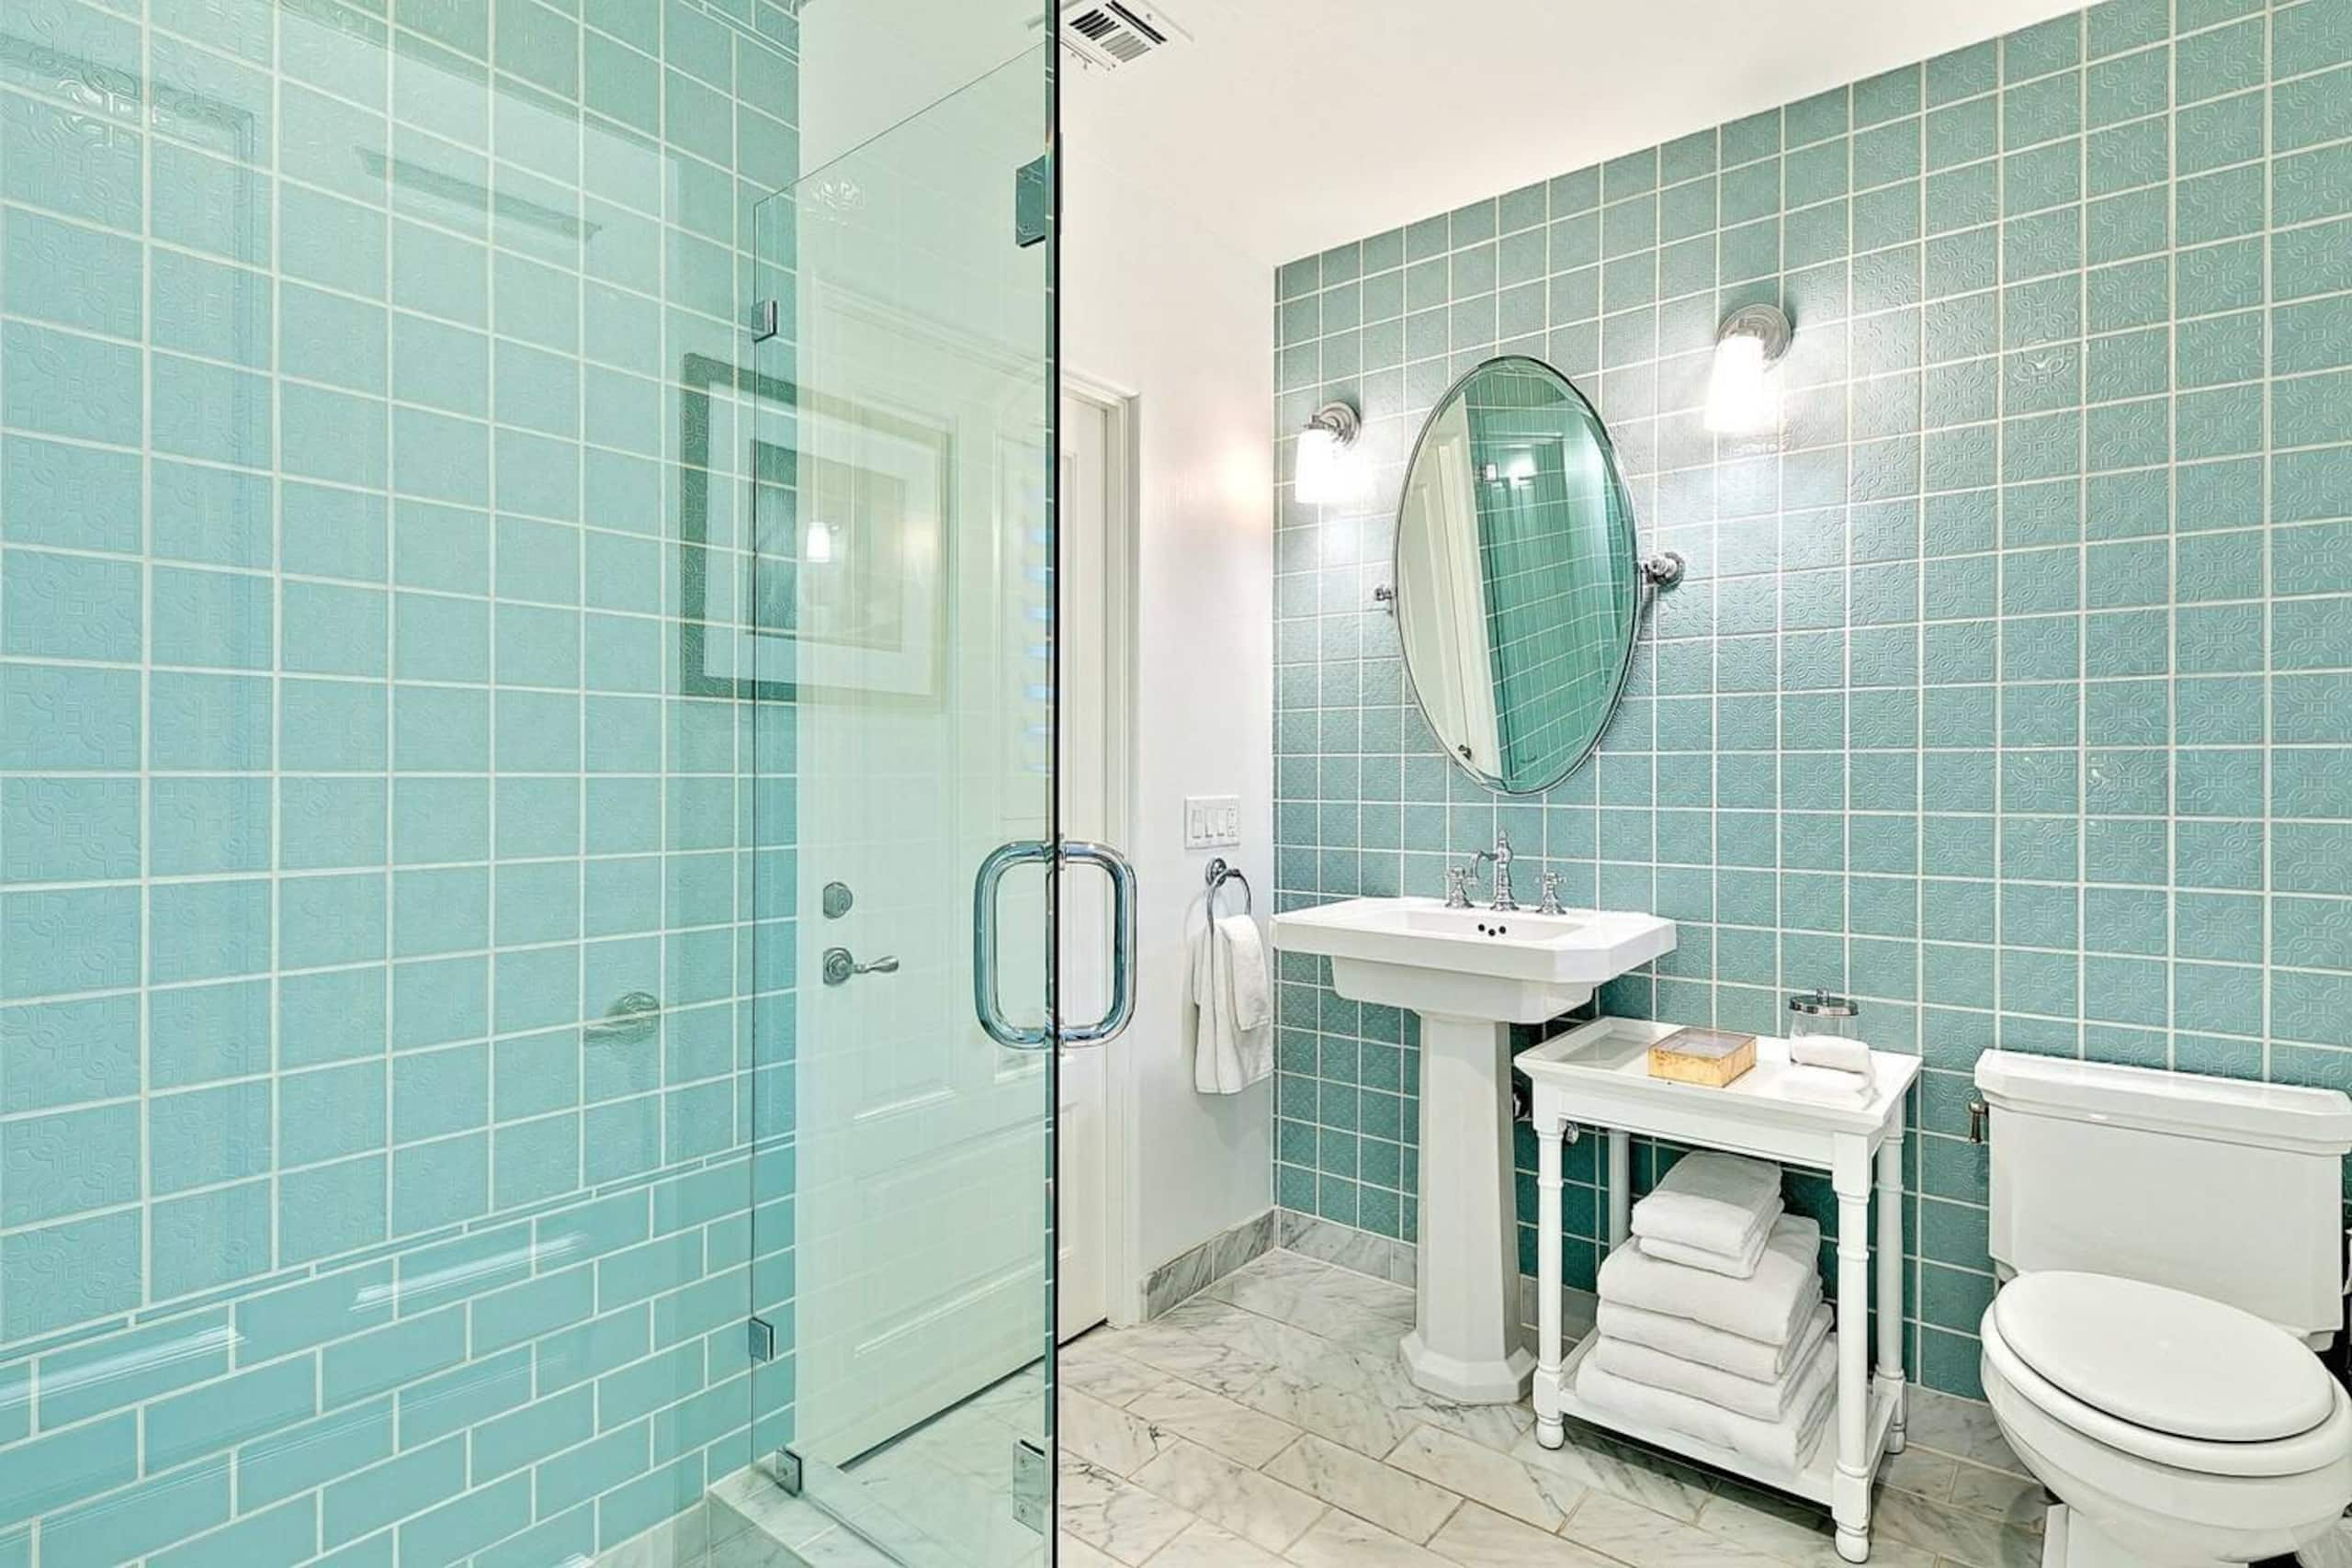 Apartment Villa Shawaiz - Beachfront Villa with 5 beds  photo 20329708